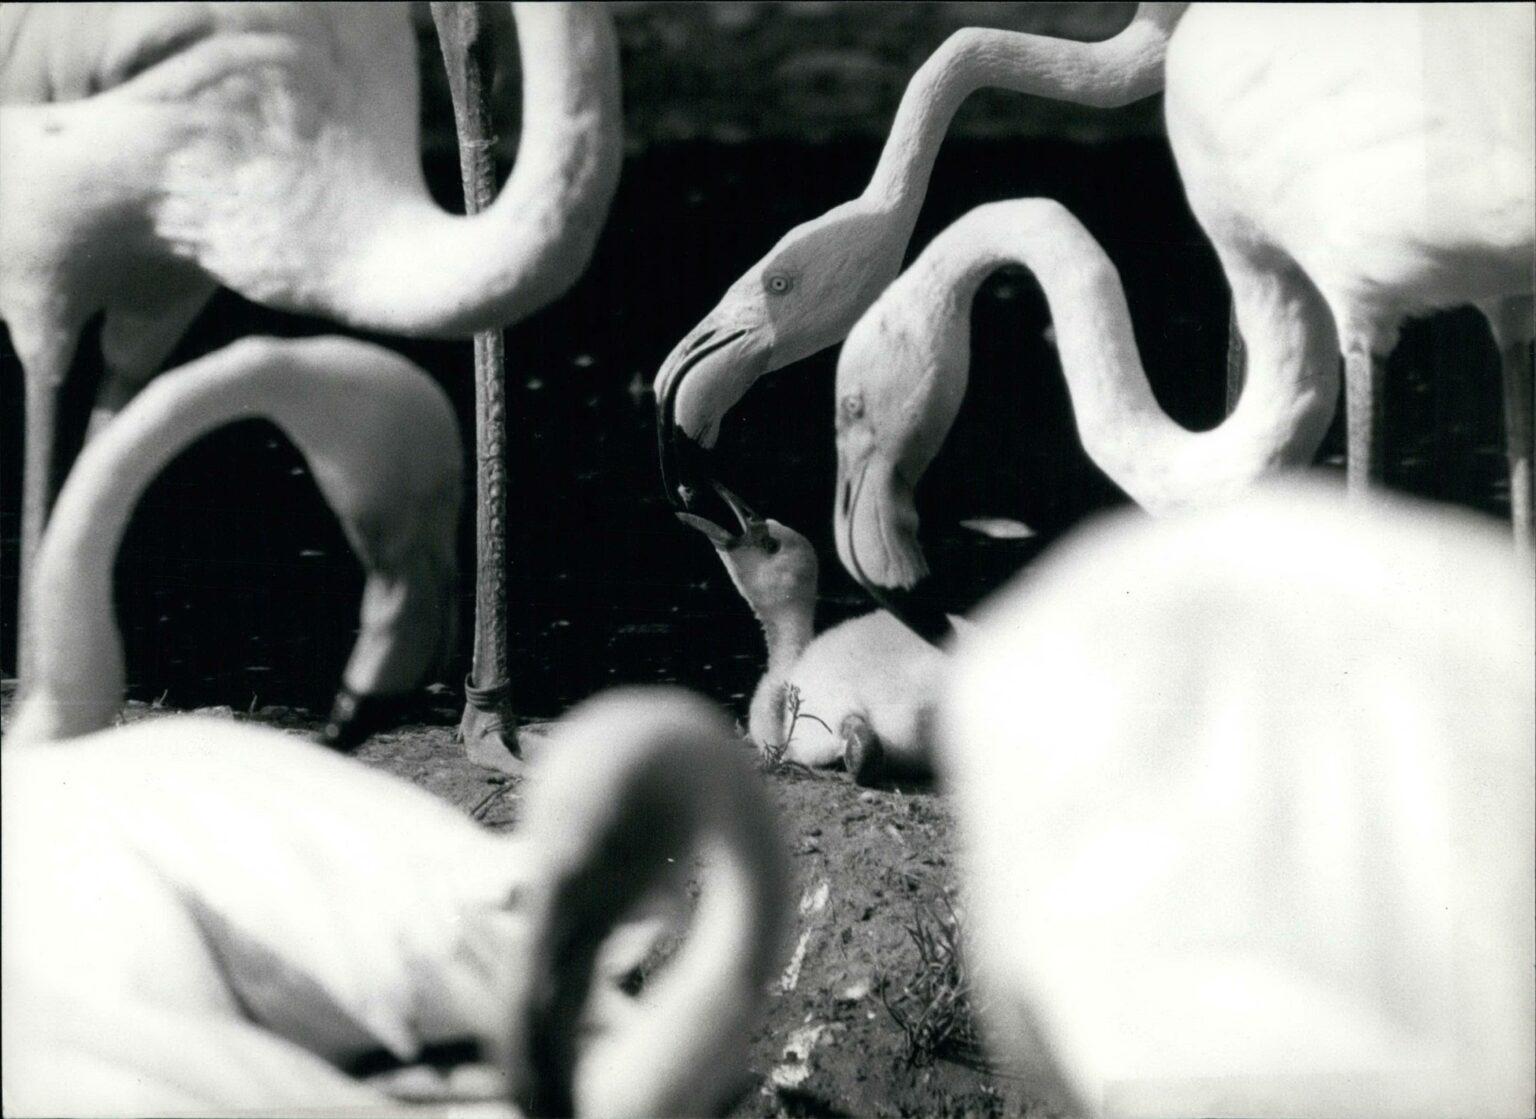 IMAGO / ZUMA / Keystone